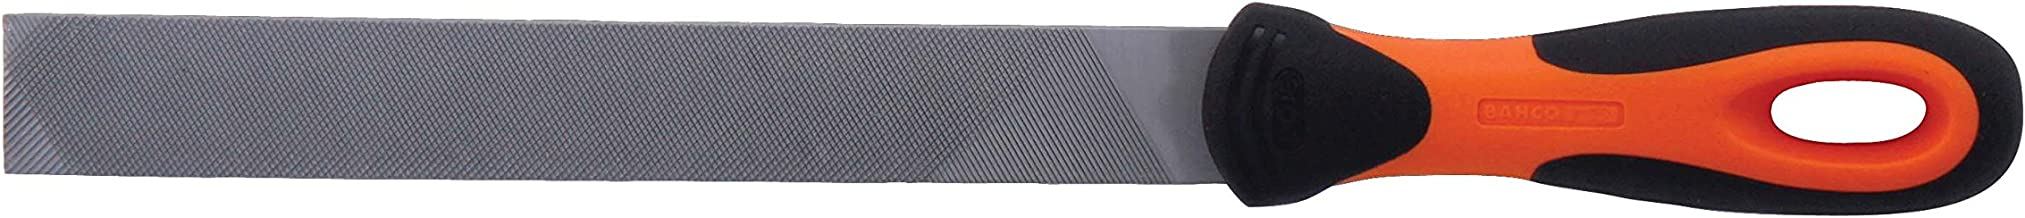 Bahco 1-100-06-1-2 LIMA PLANA PARAL C/MANG 6 BAST, 15.2 cm